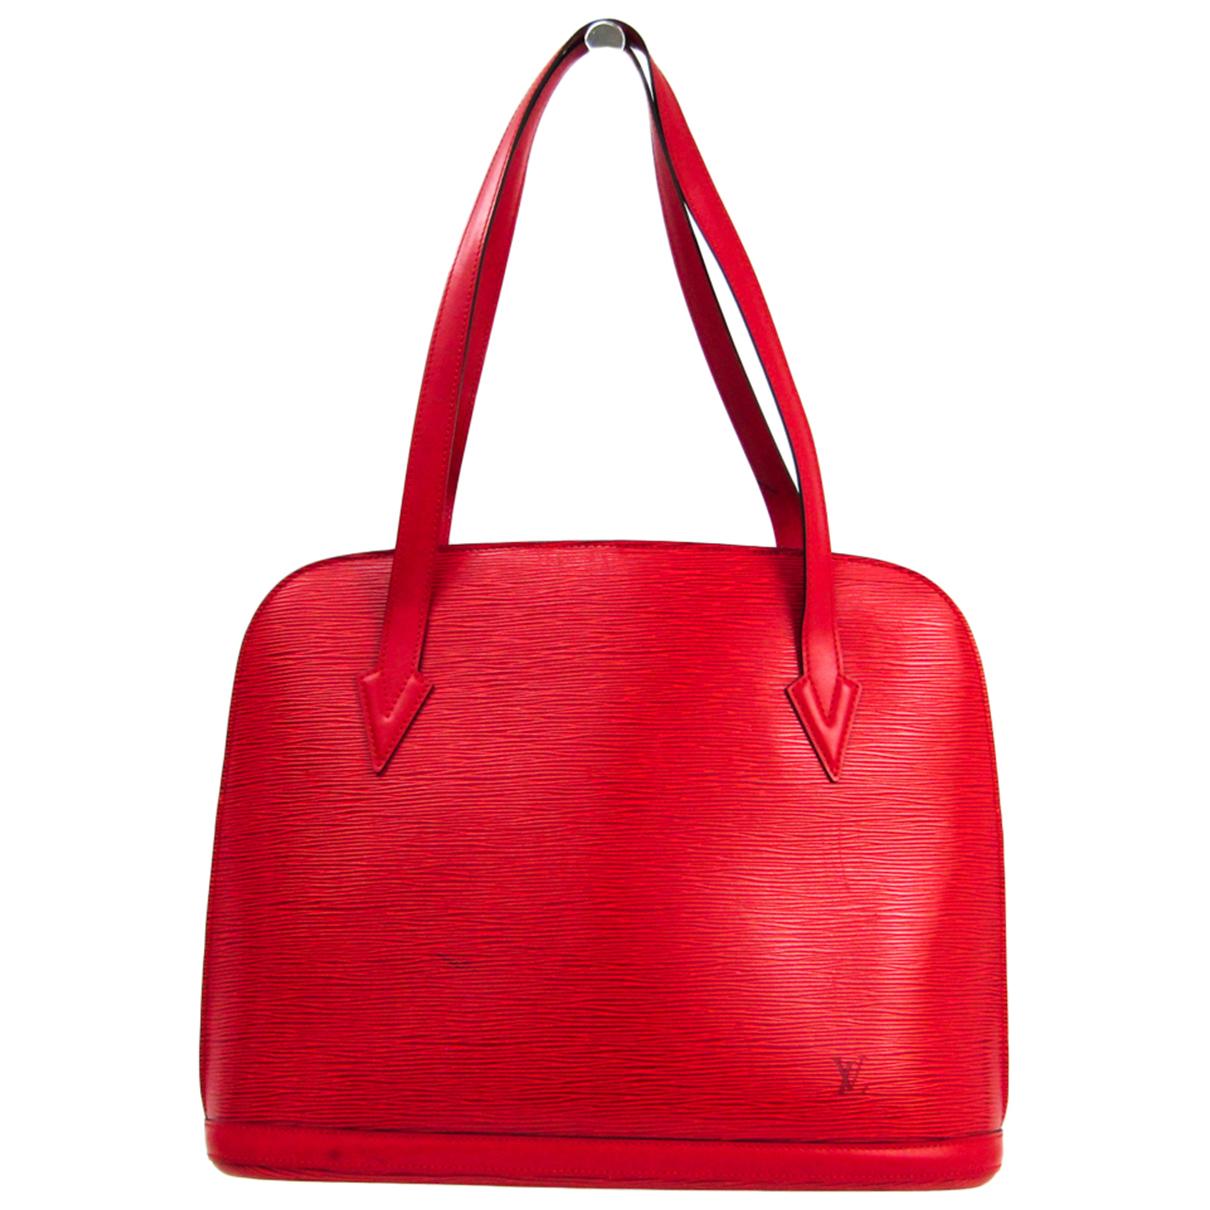 Louis Vuitton Lussac Red Leather handbag for Women N